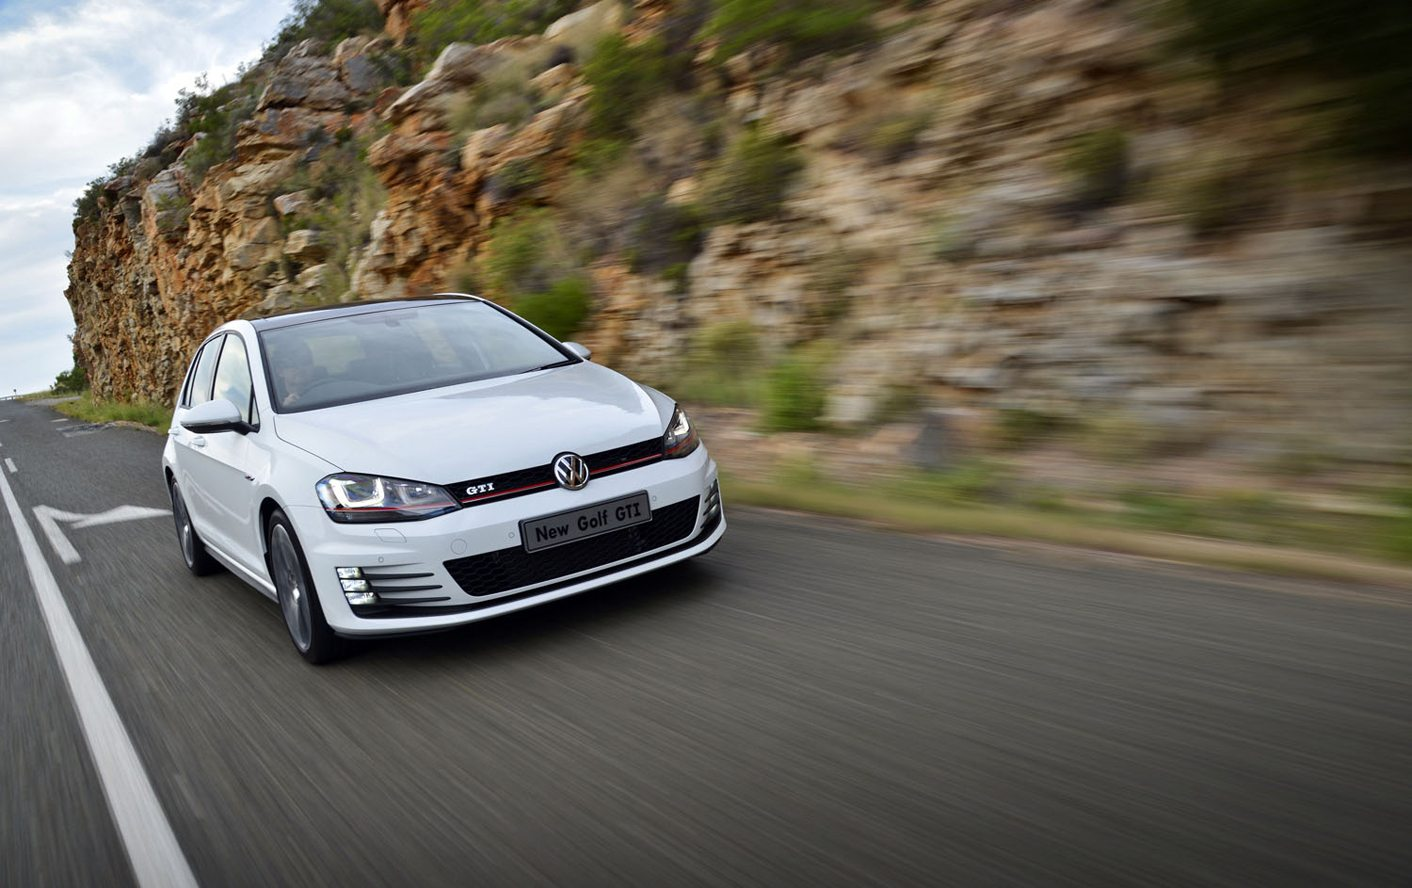 VW Golf GTI 7: Finding that elusive balance